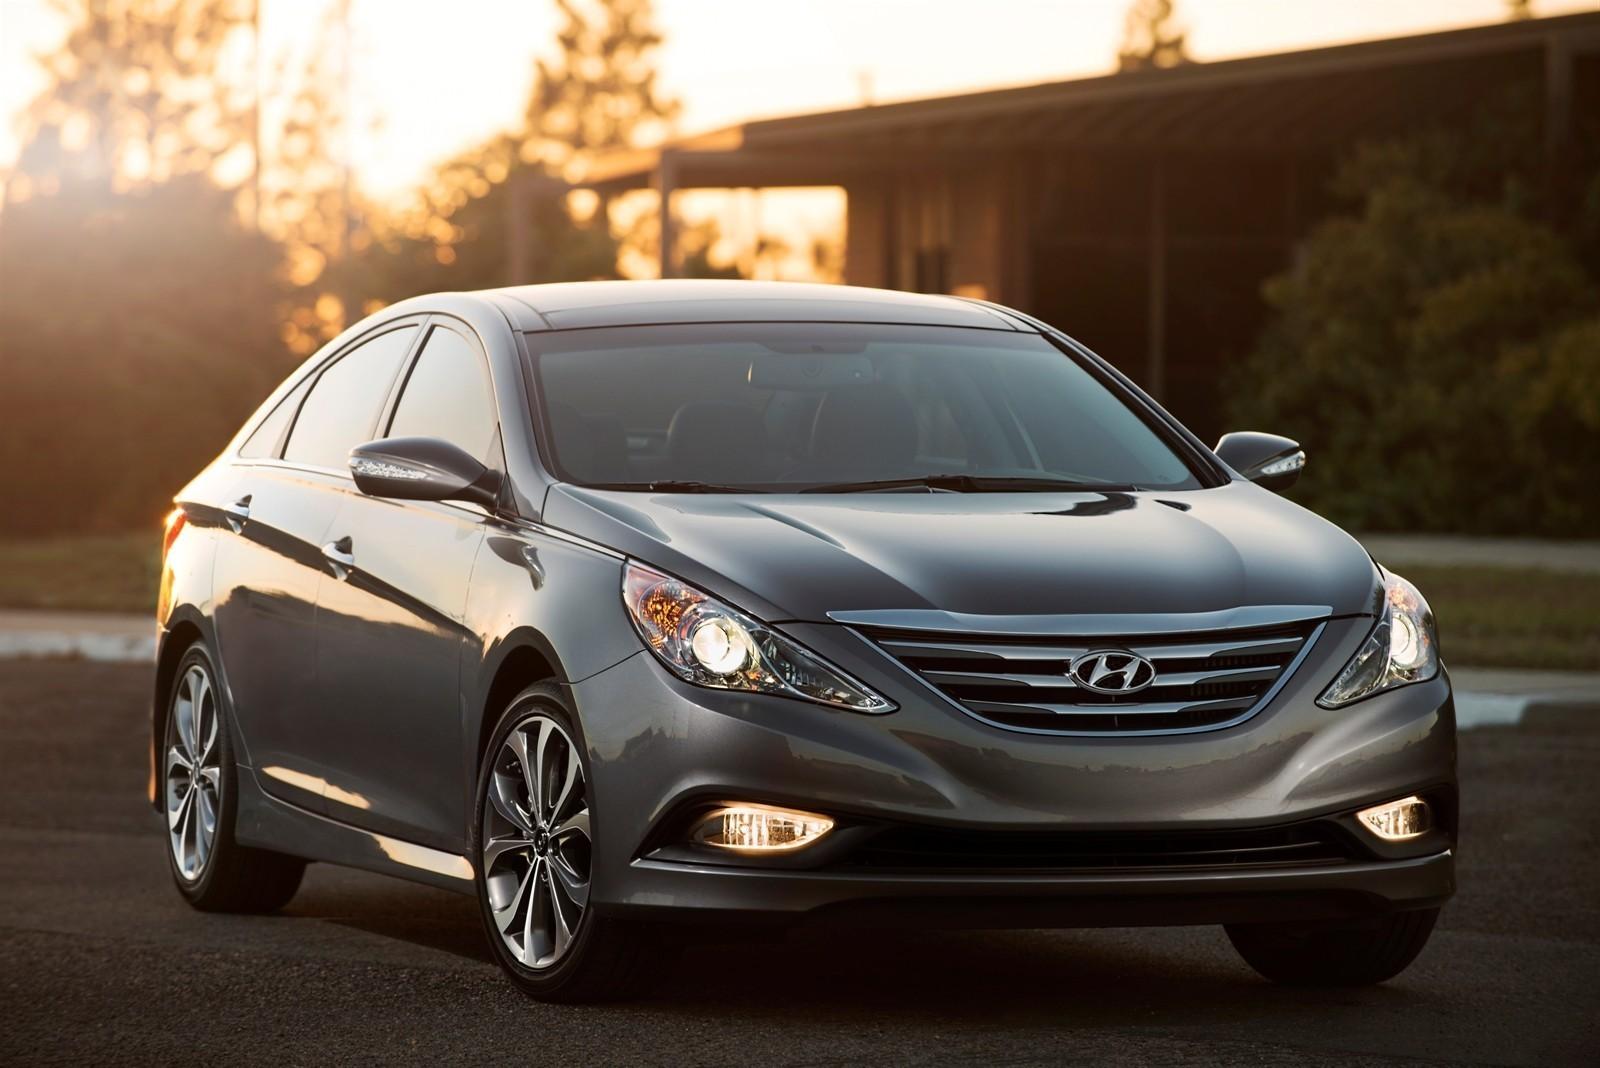 Hyundai recalls 2011 to 2014 sonata for defective gear shifter chicago tribune